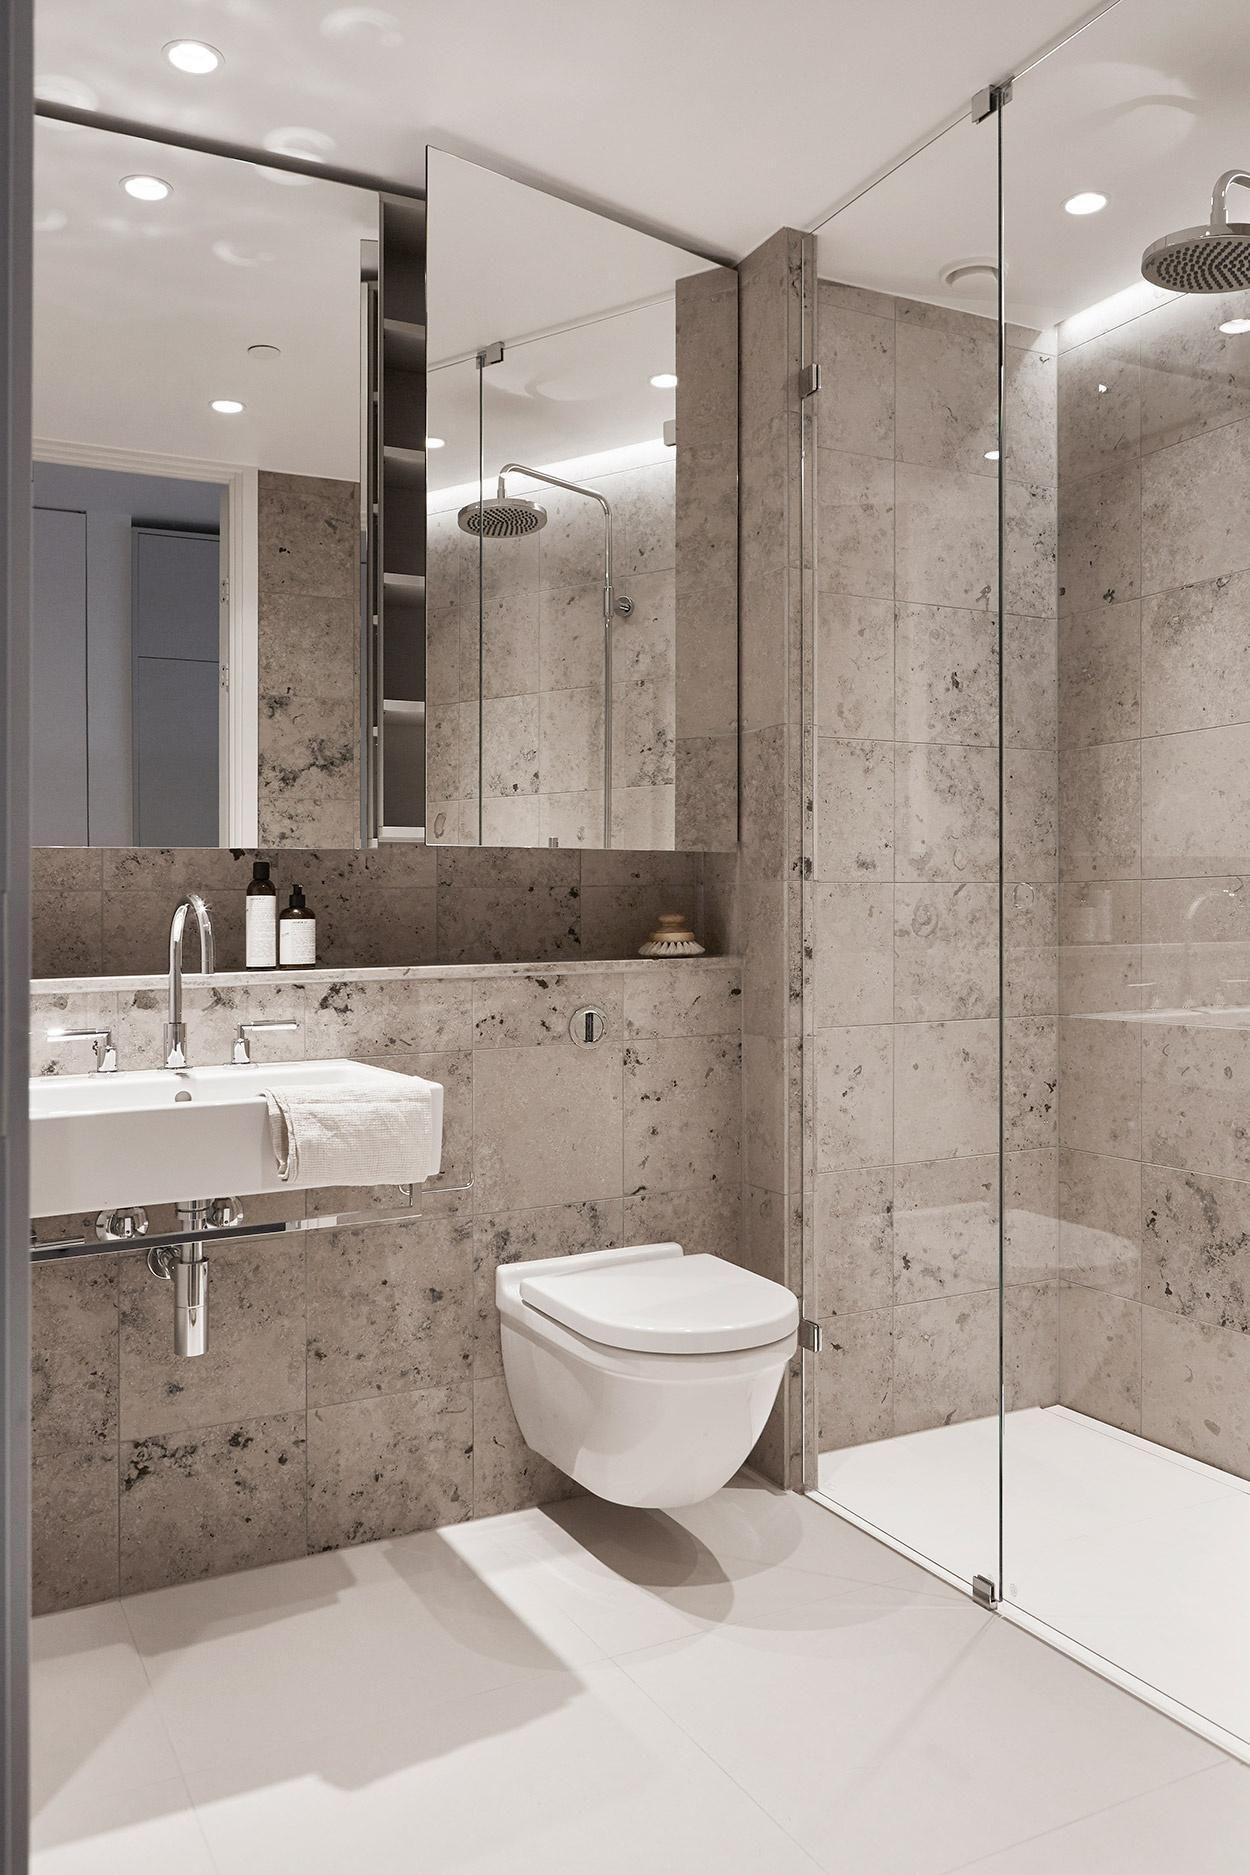 25 Minimalist Small Bathroom Ideas Feel The Big Space Minimalist Bathroom Modern Bathroom Design Bathroom Interior Design